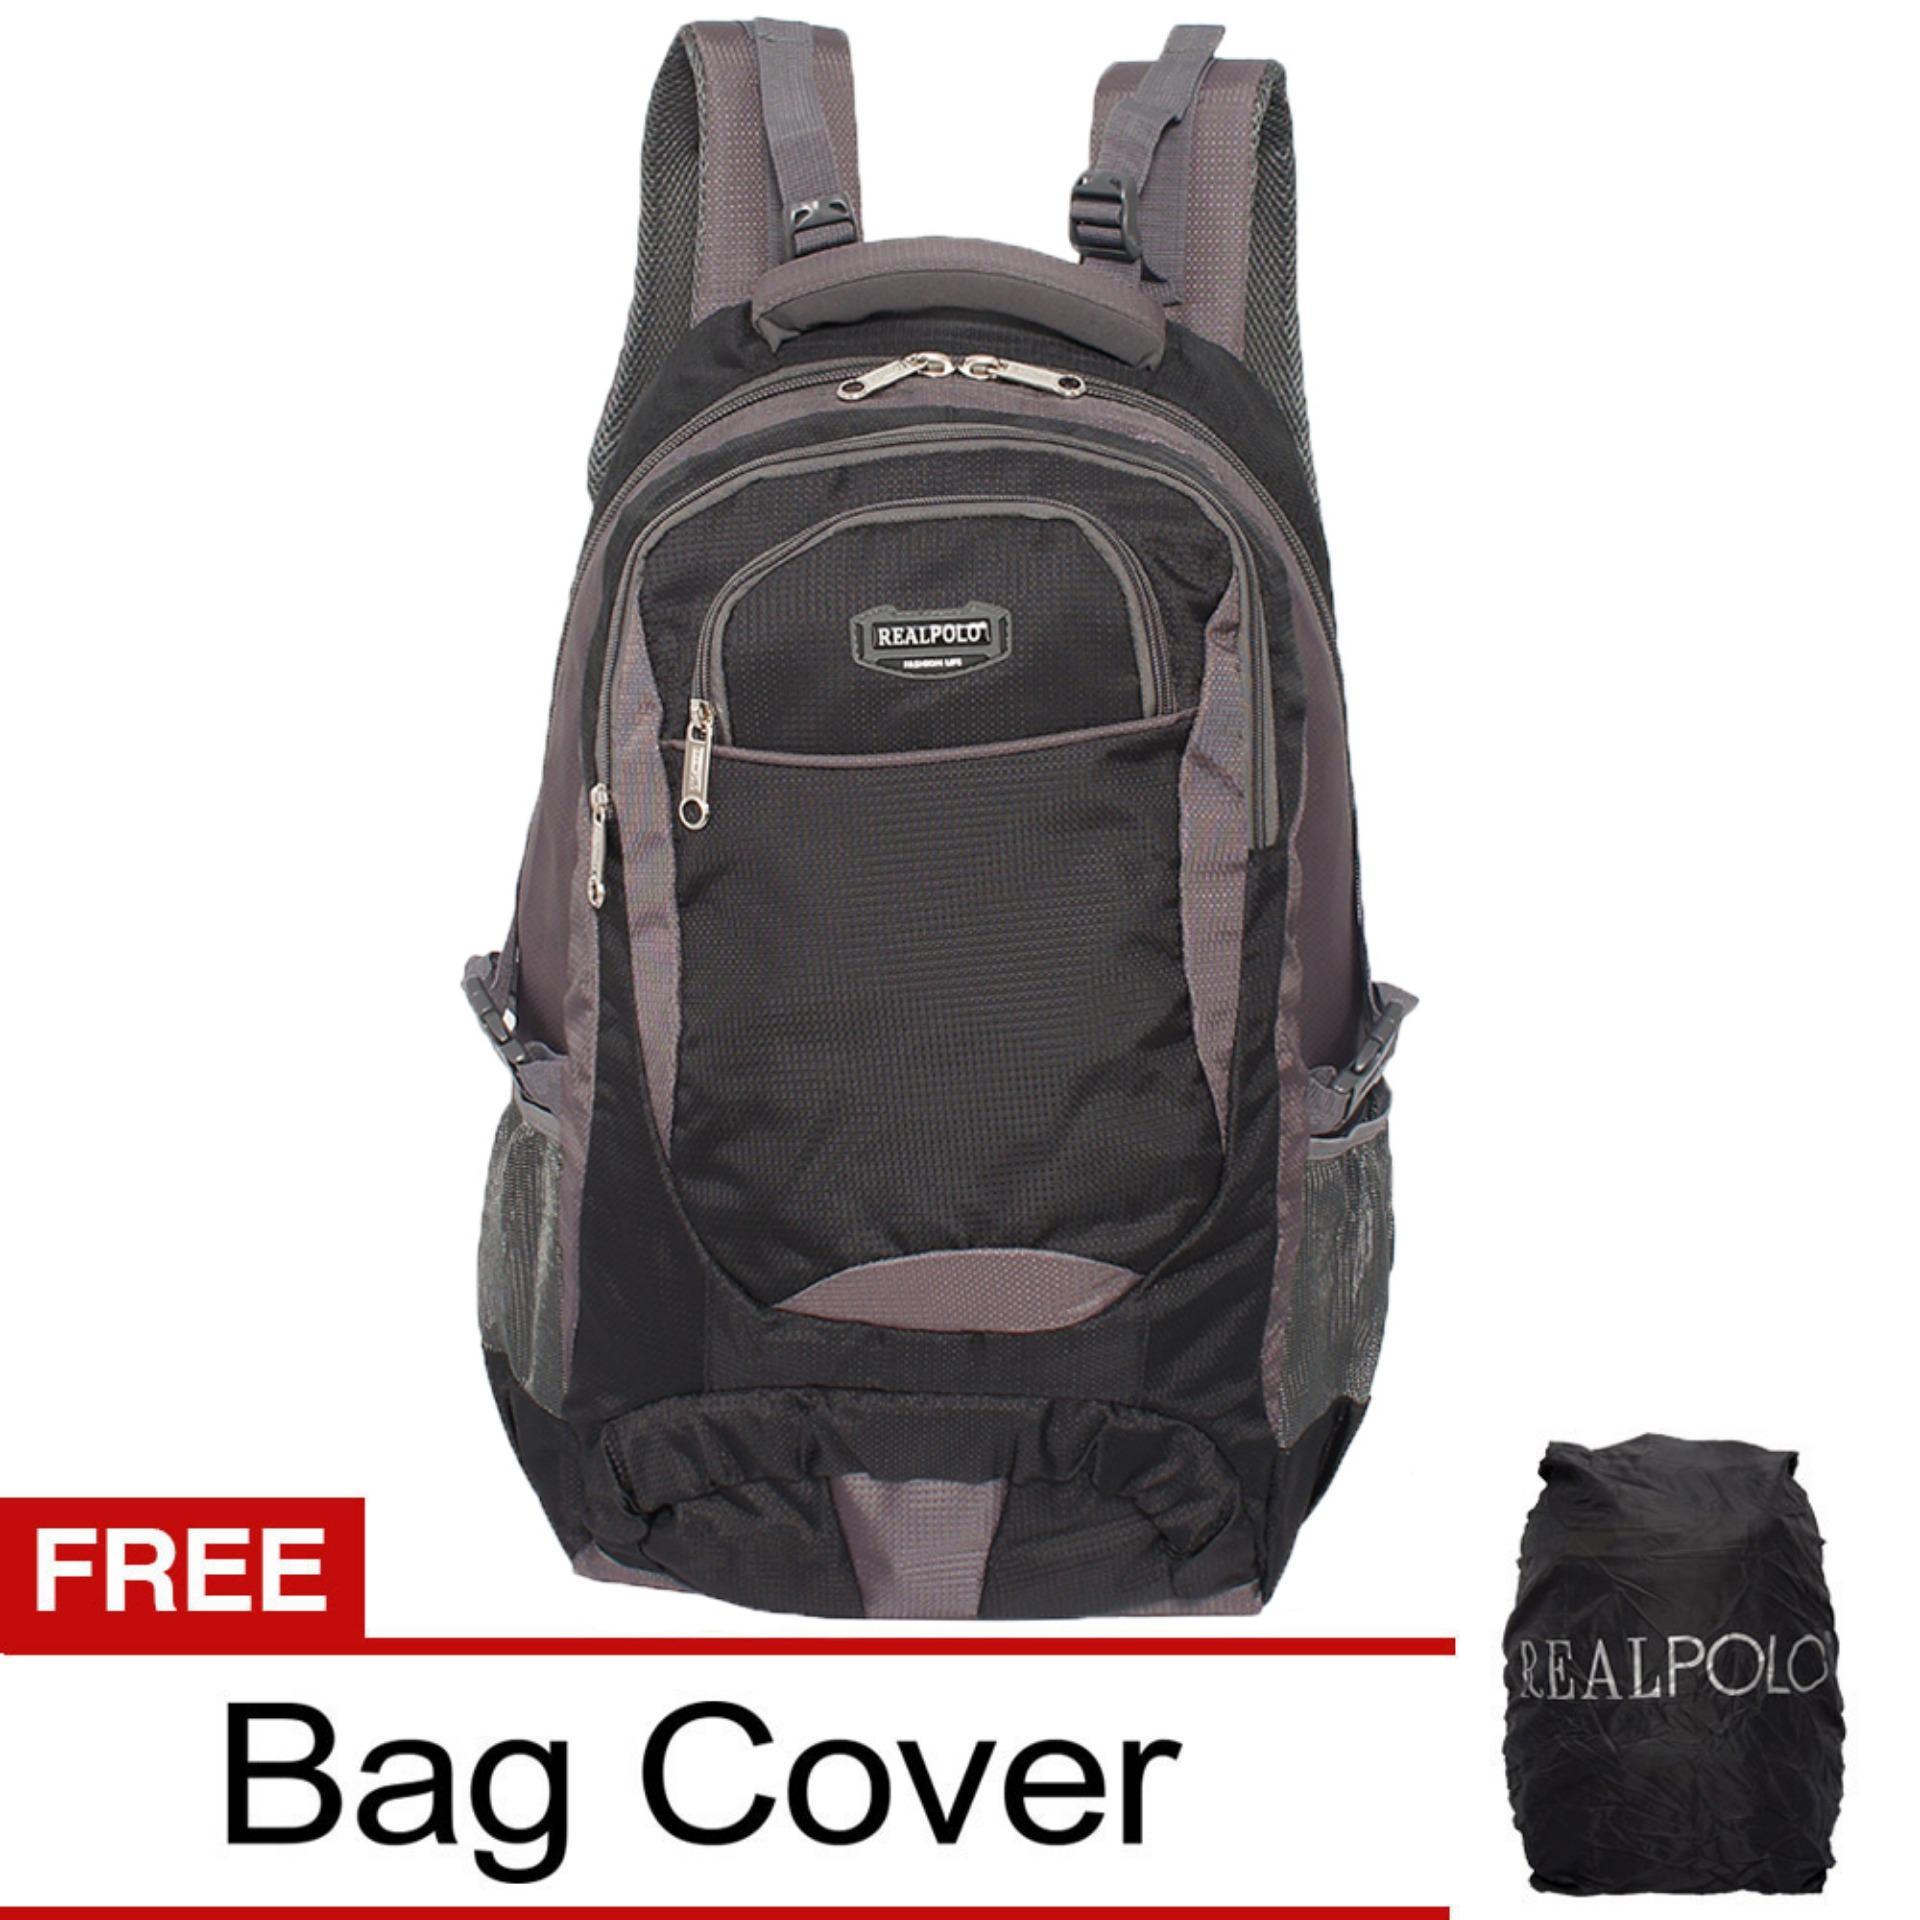 Real Polo Tas Ransel Kasual Tas Punggung Jumbo HCBH Backpack XL Bonus Bag Cover - Hitam